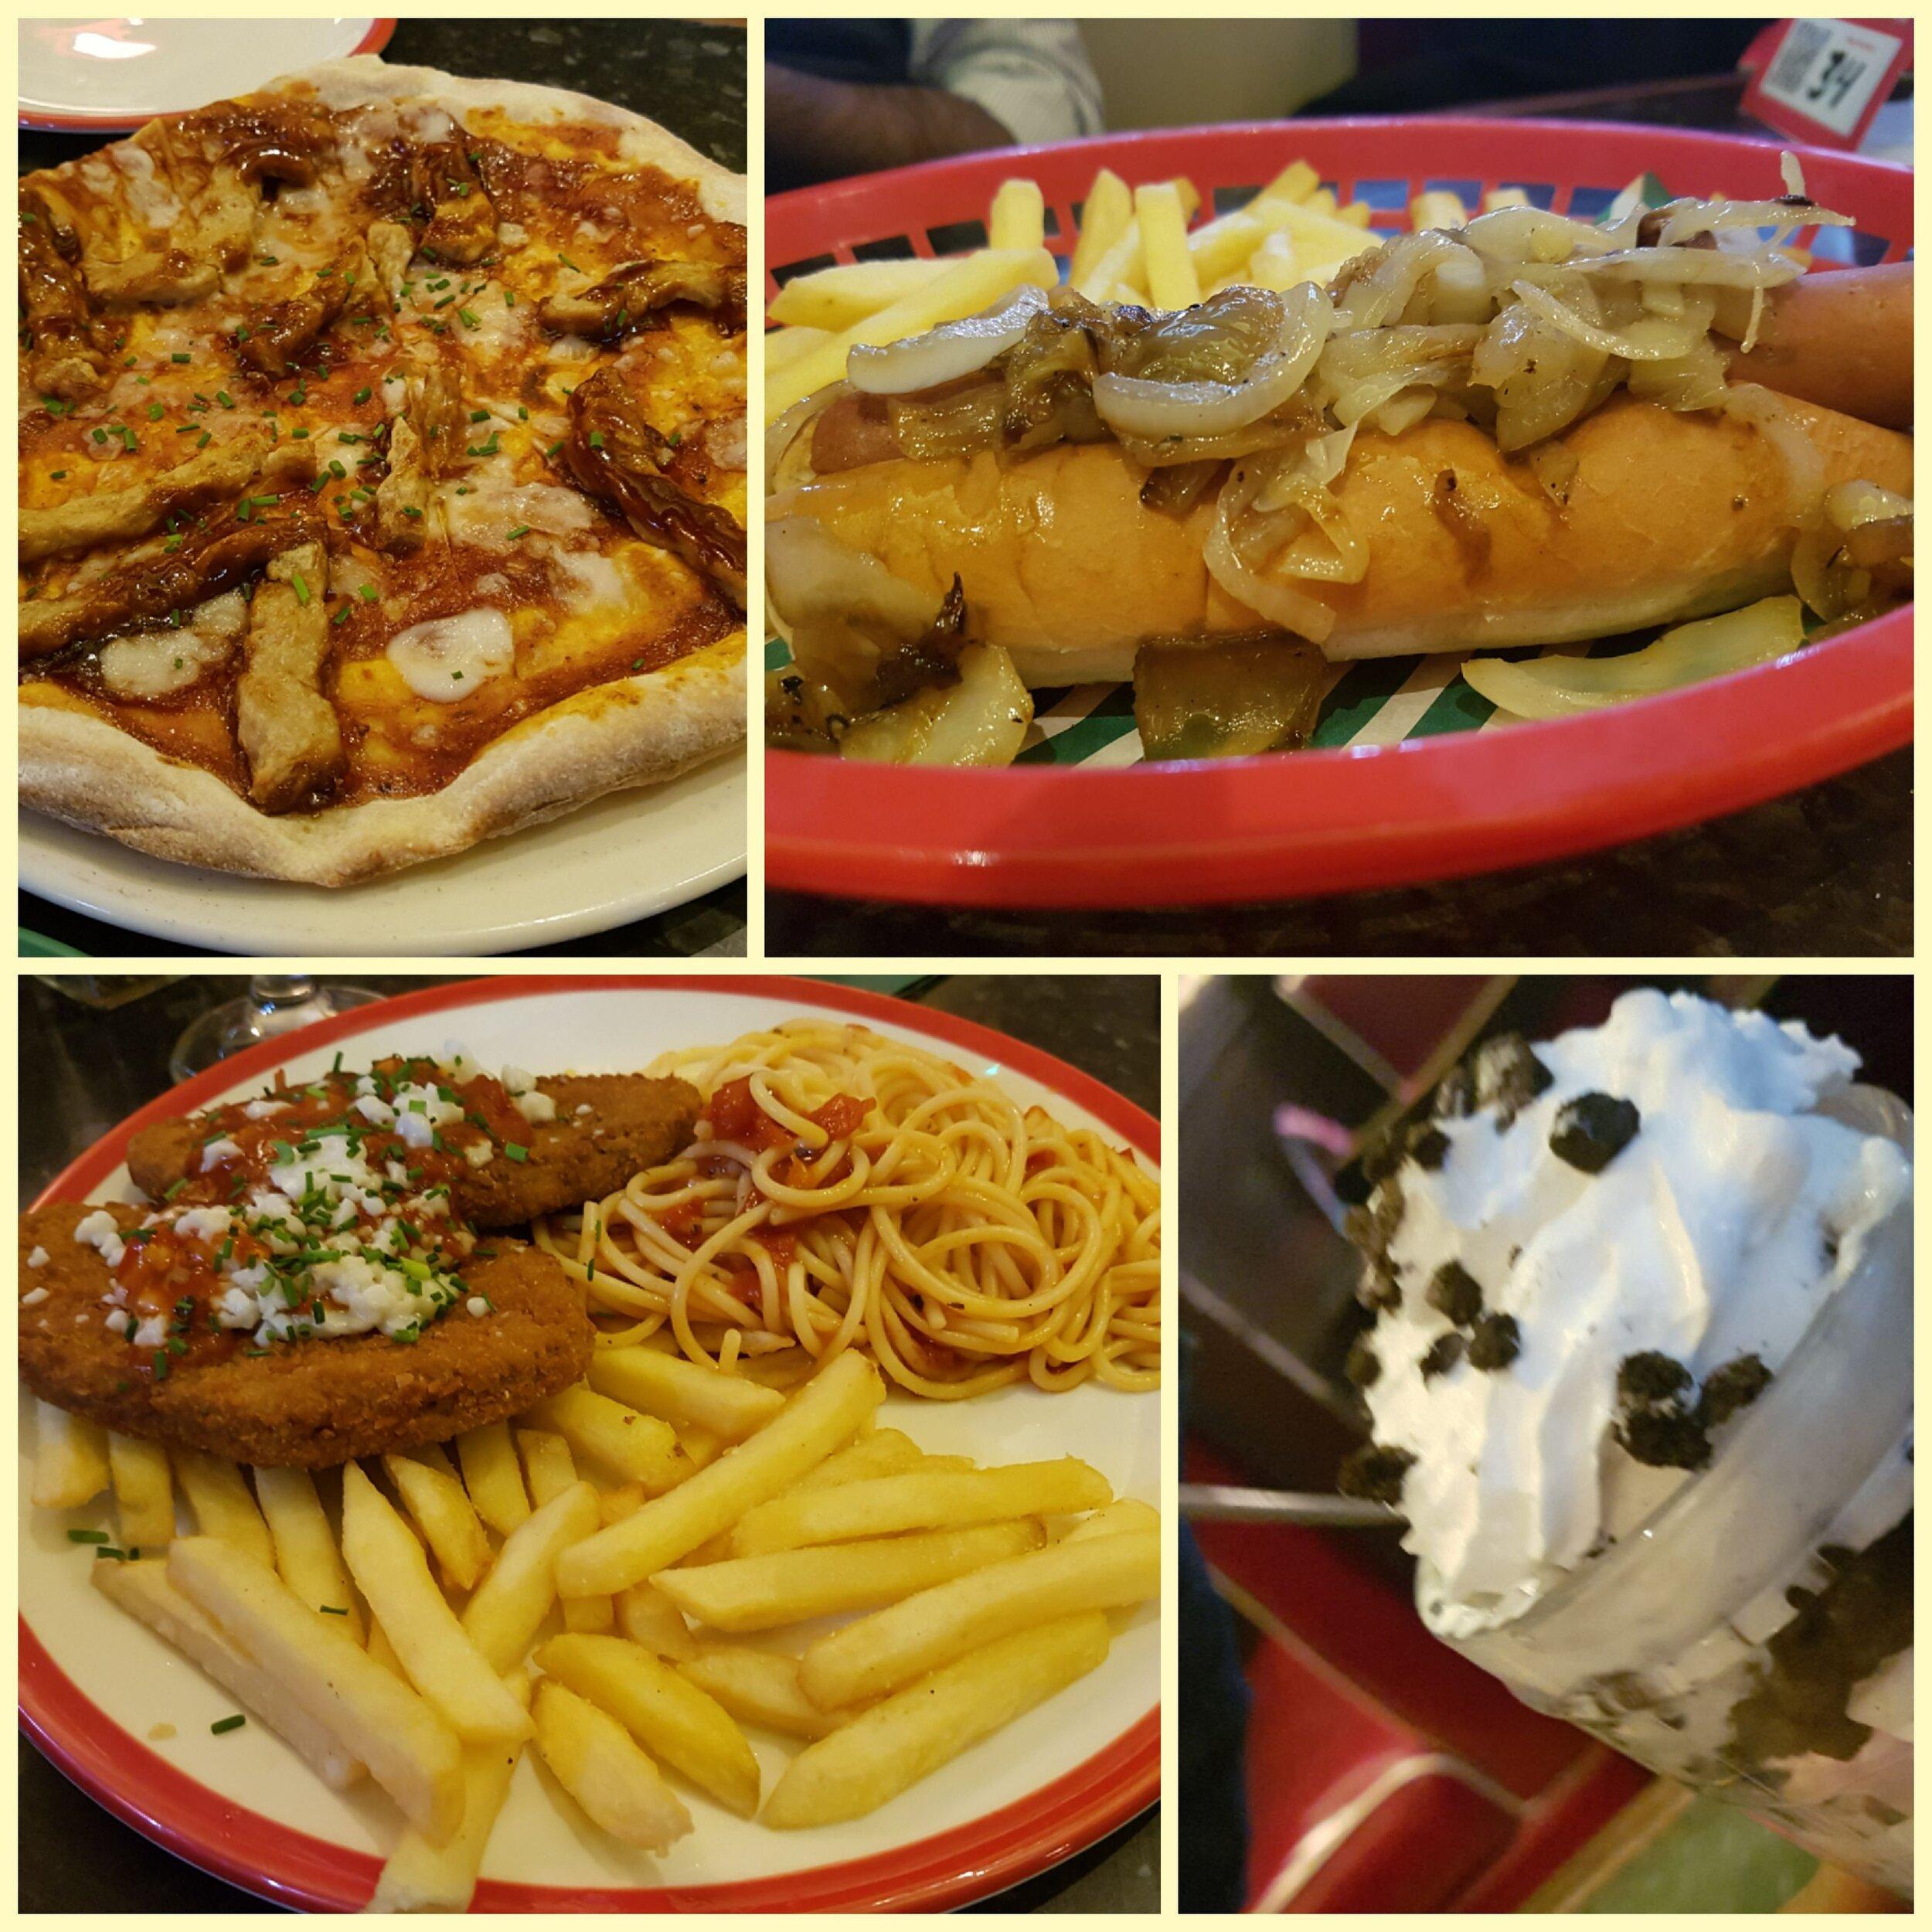 Vegan options at Frankie & Benny's